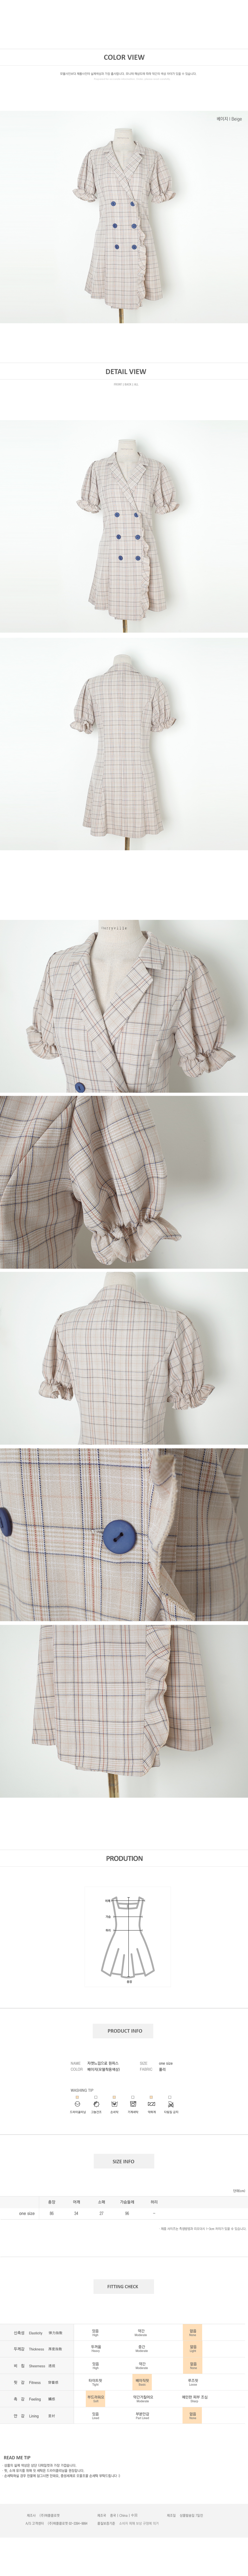 Dress with a sense of jacket